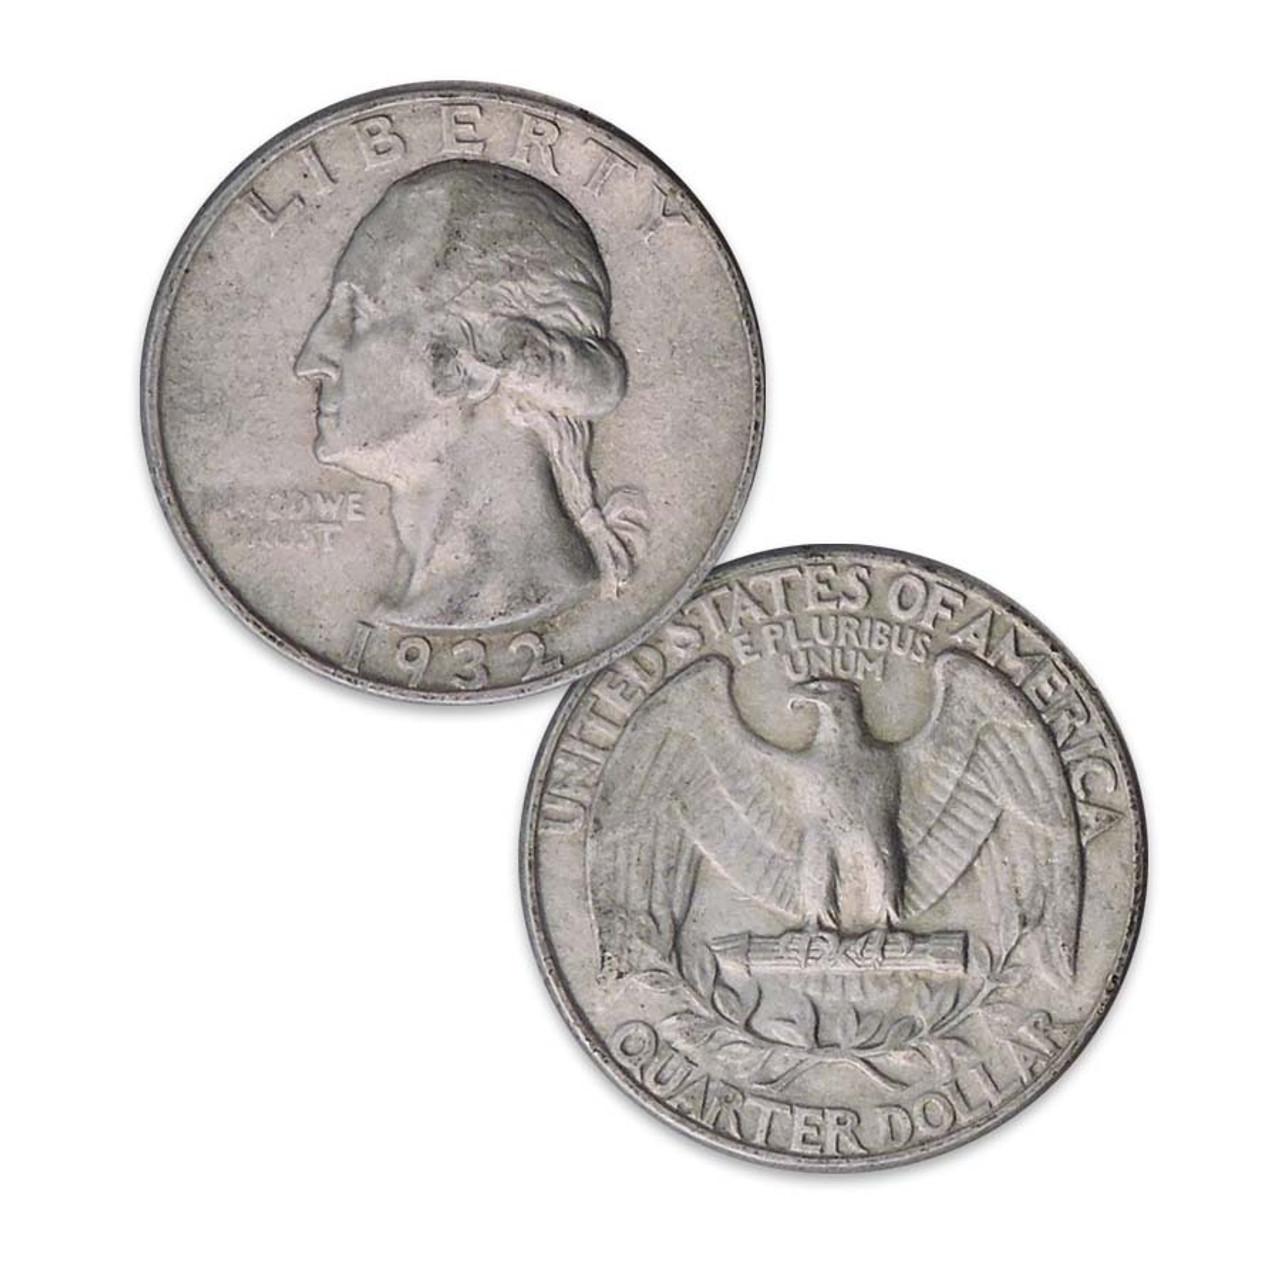 1932 Washington Silver Quarter Extra Fine Image 1